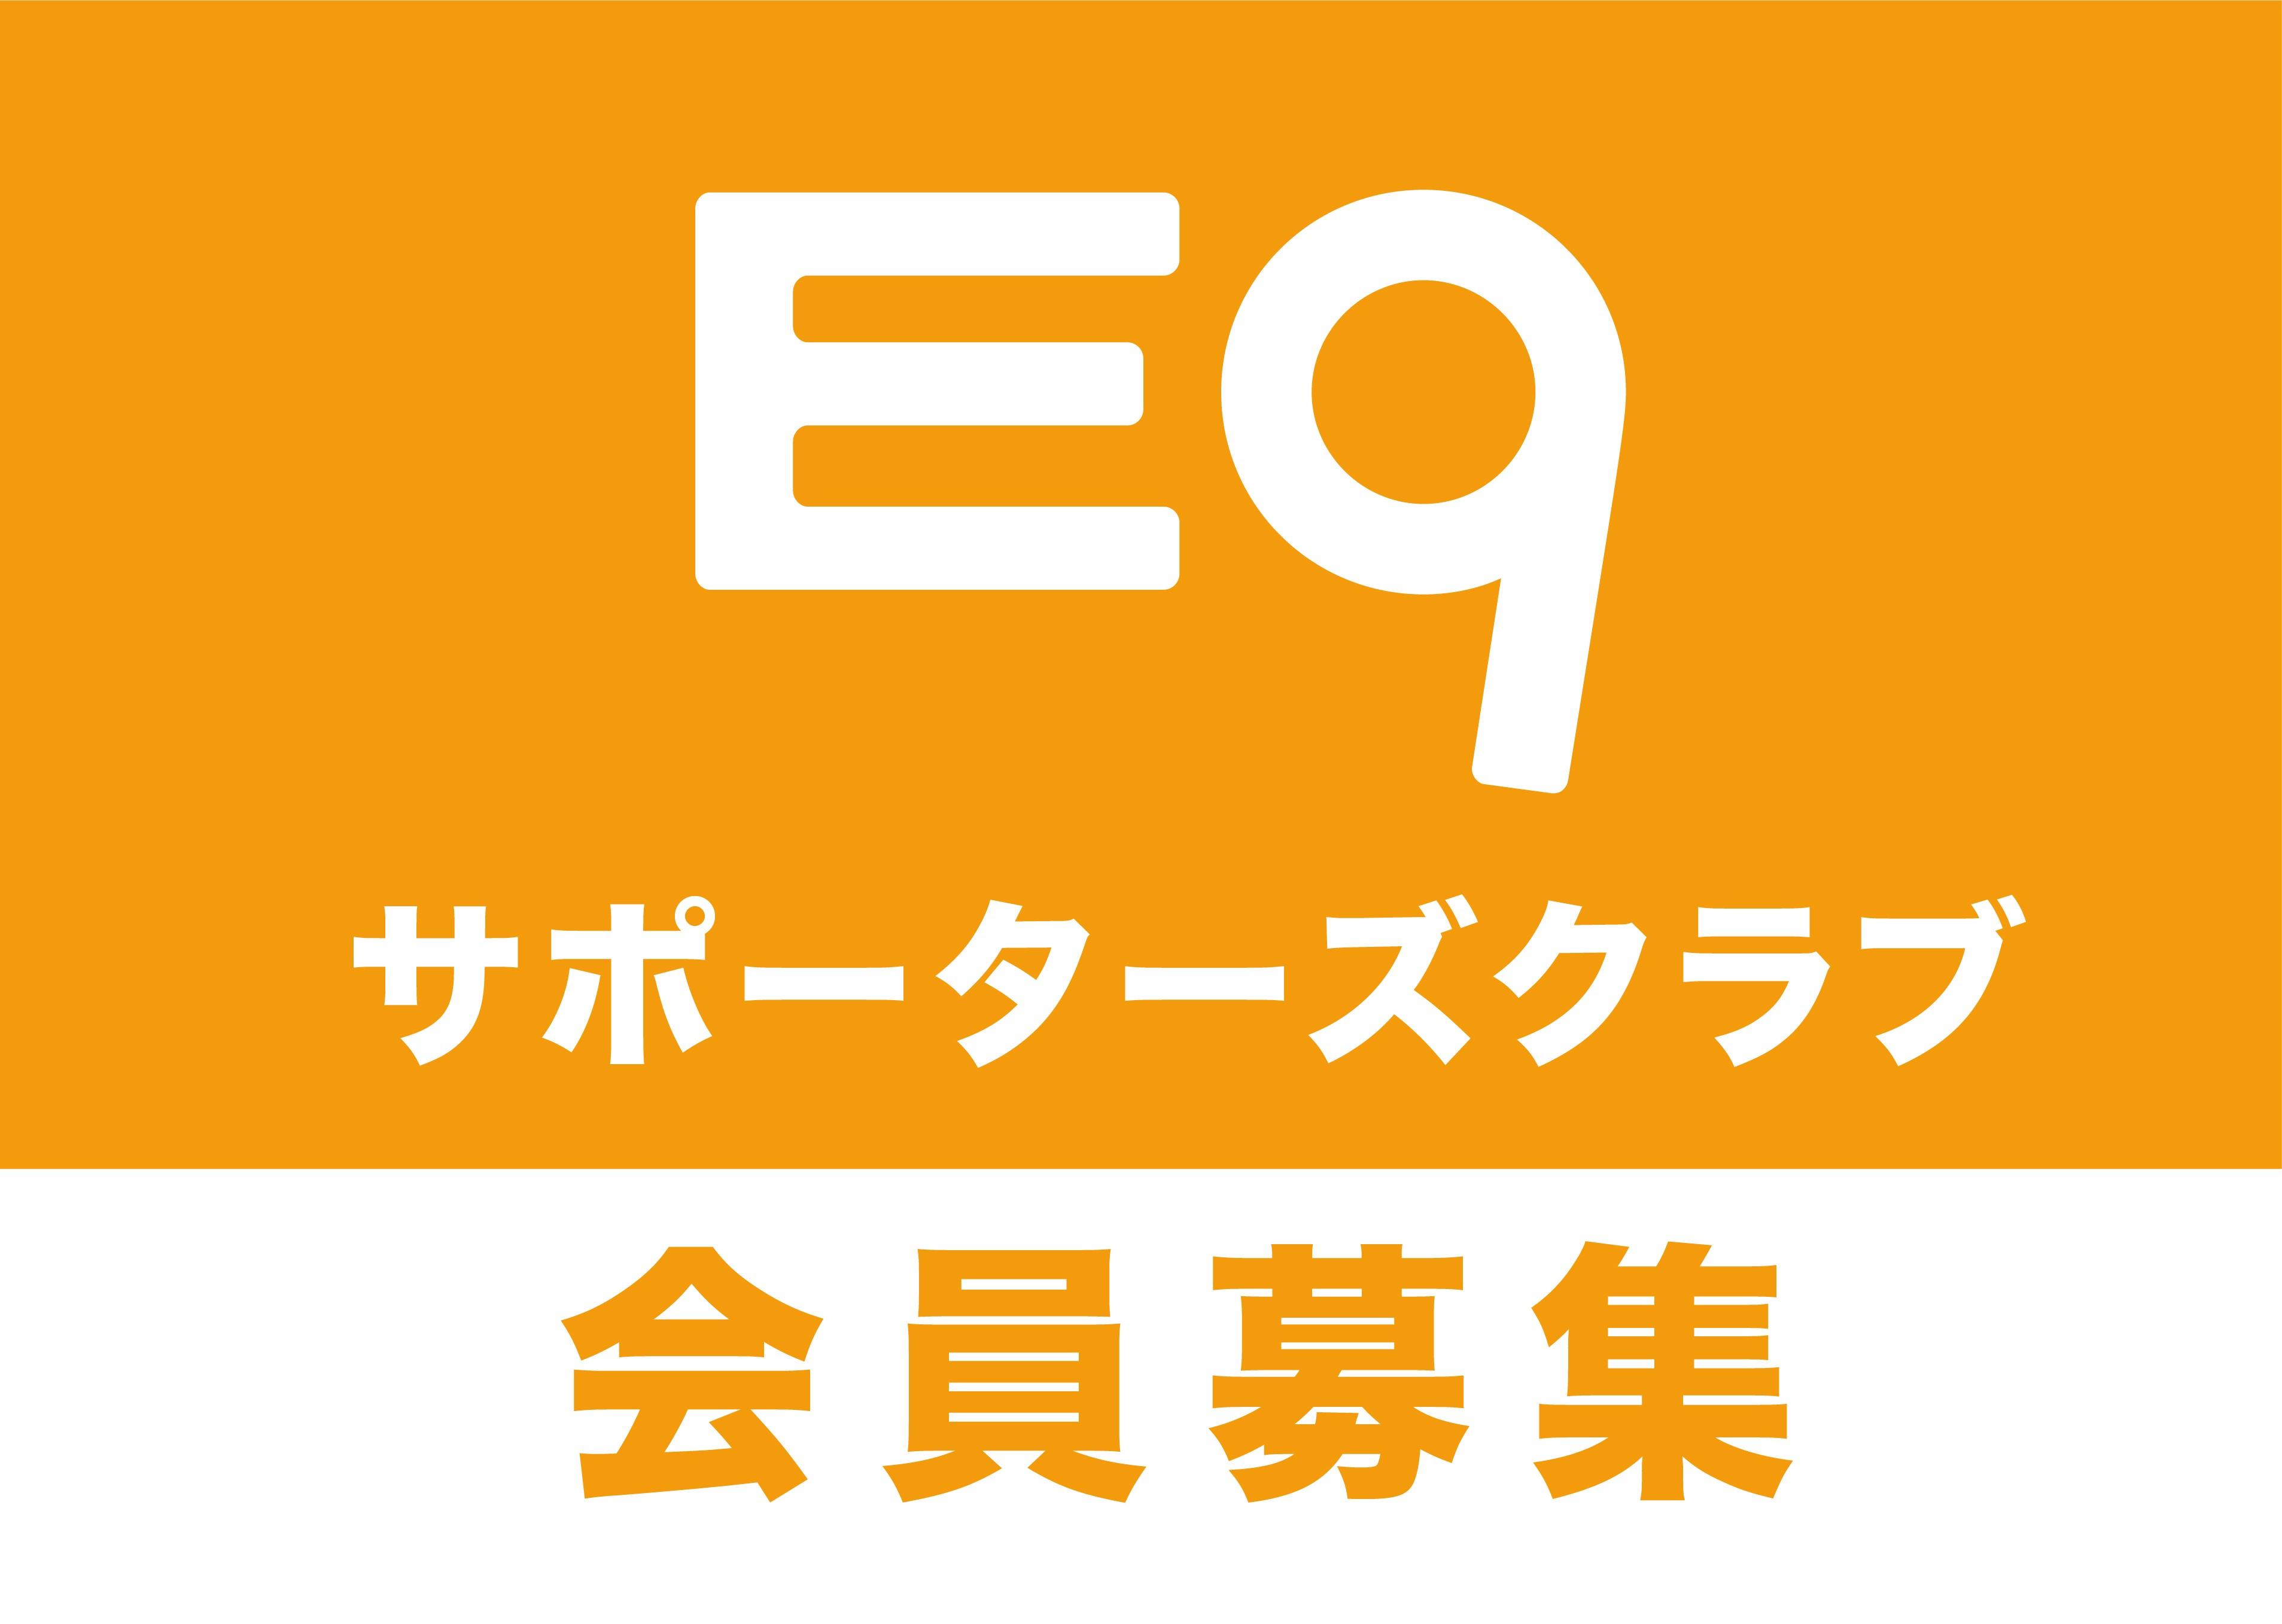 E9サポーターズクラブ会員募集